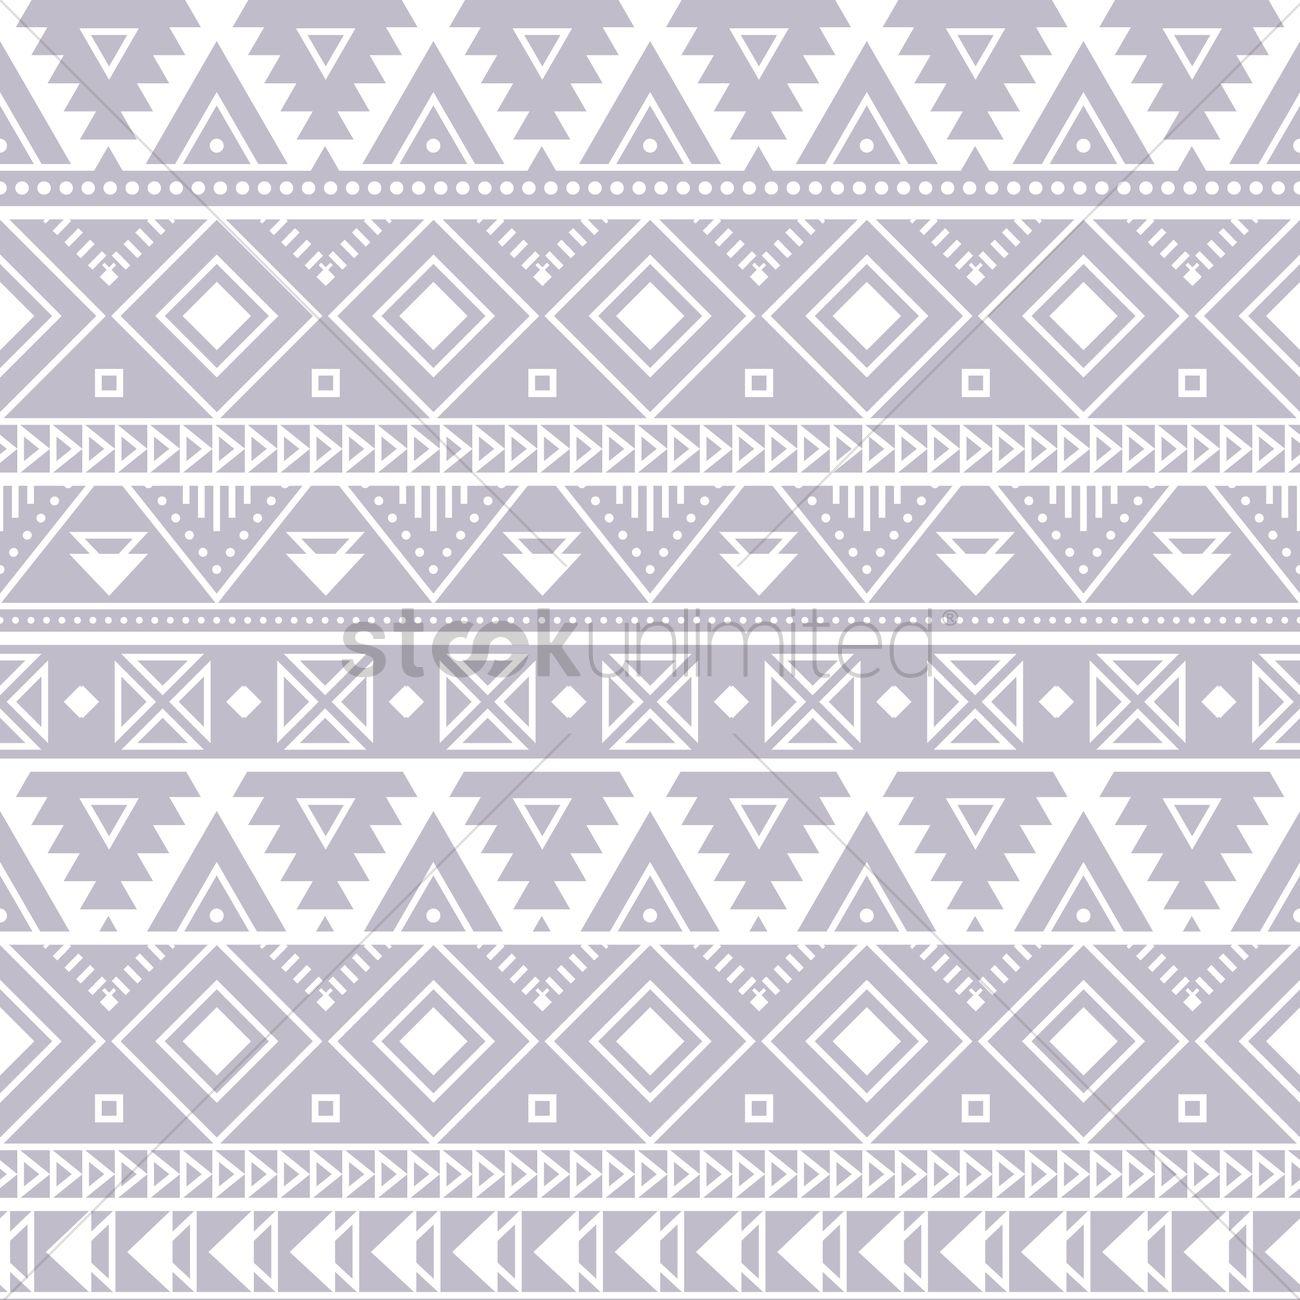 aztec background design vector image 2011898